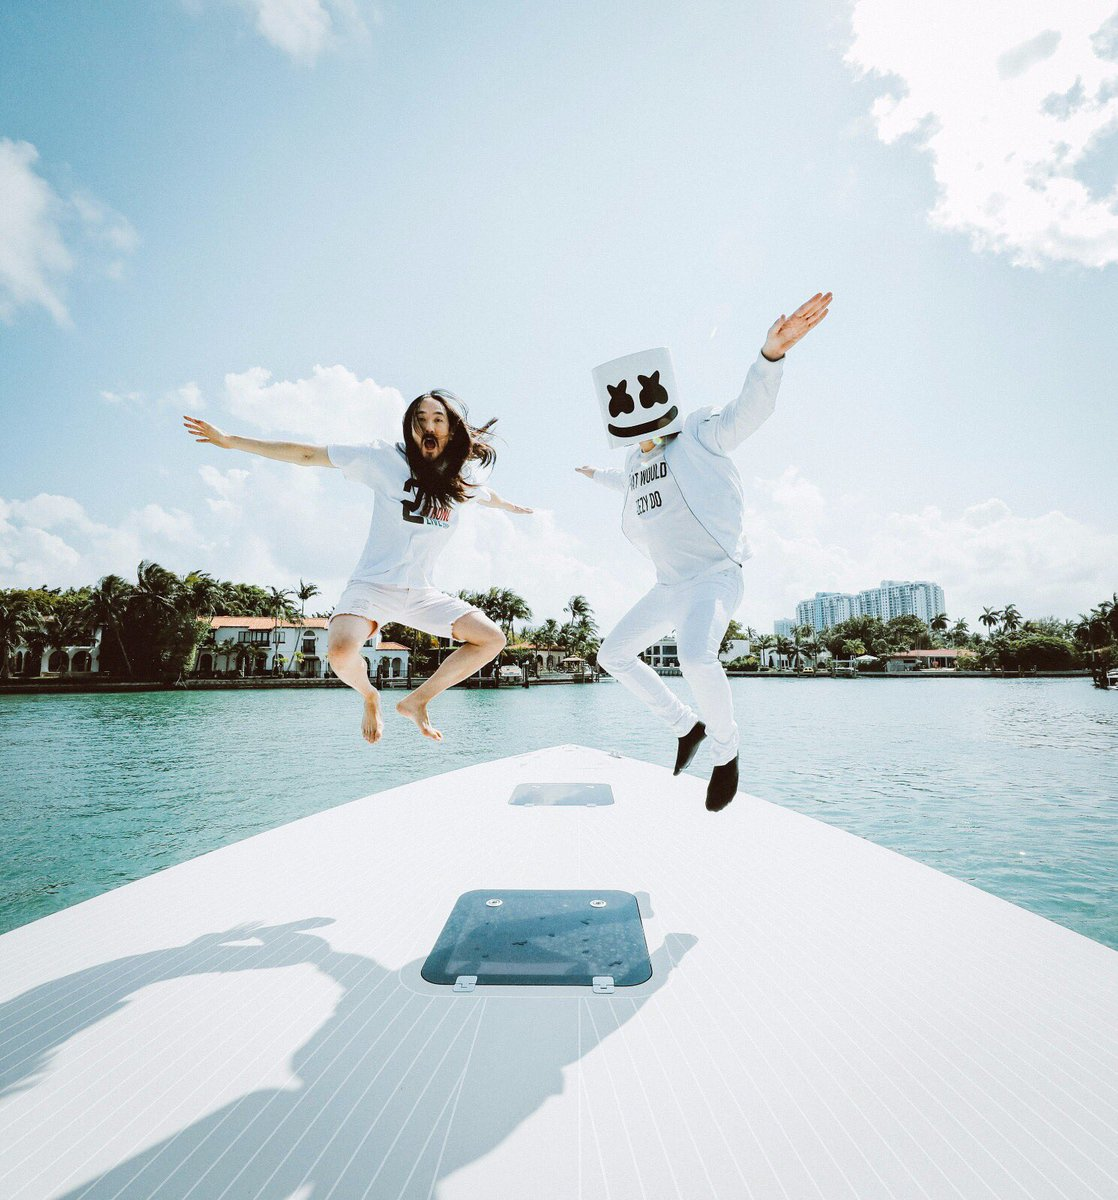 #aokijump #753. The Aoki x @marshmellomusic Jump. SS Groot. Miami Flor...